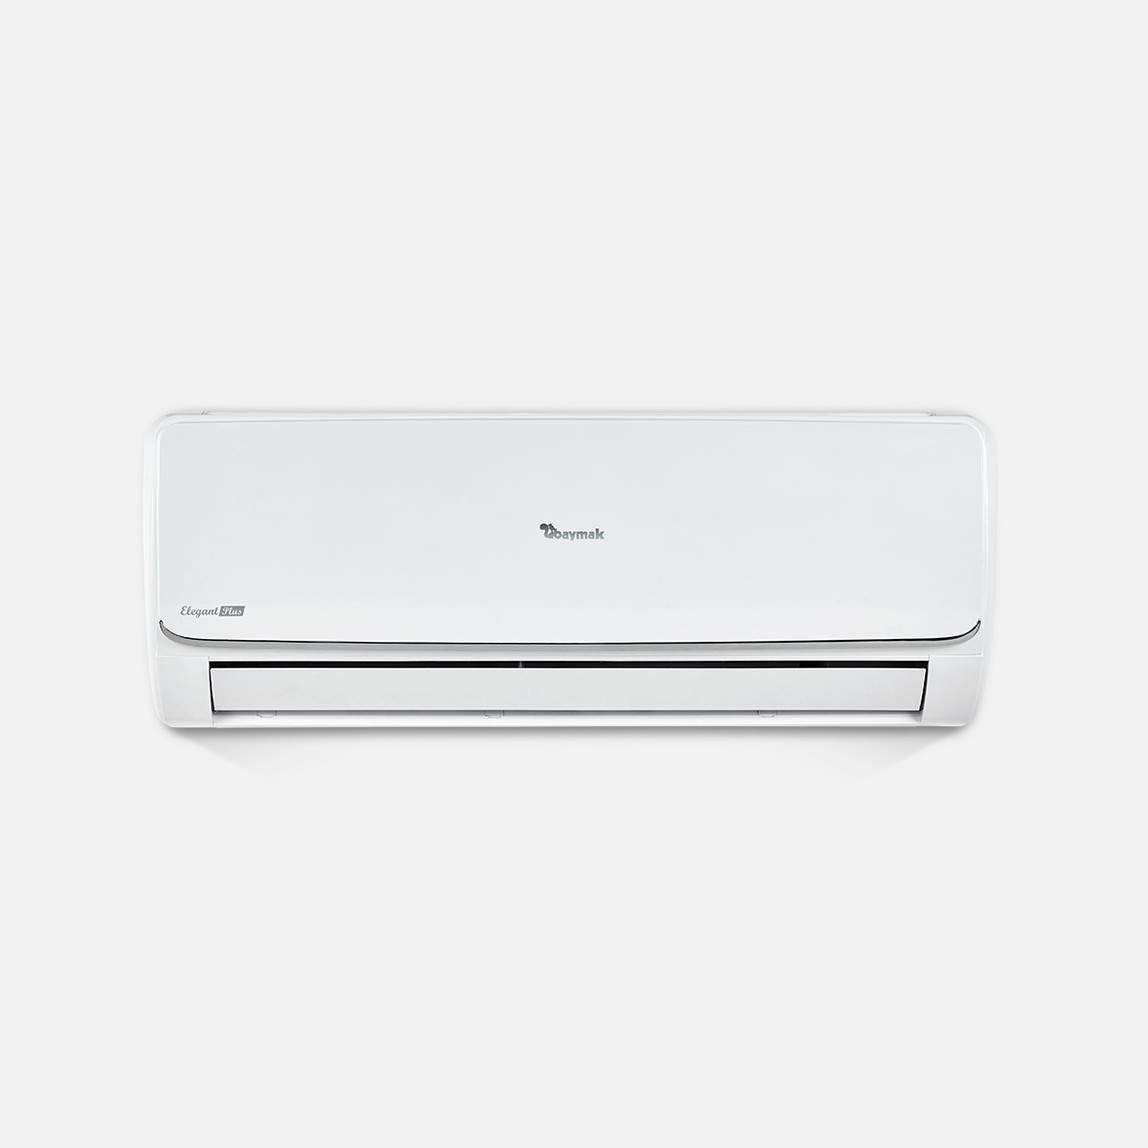 Baymak Elegant Plus R32 09 A++Montaj Dahil Klima